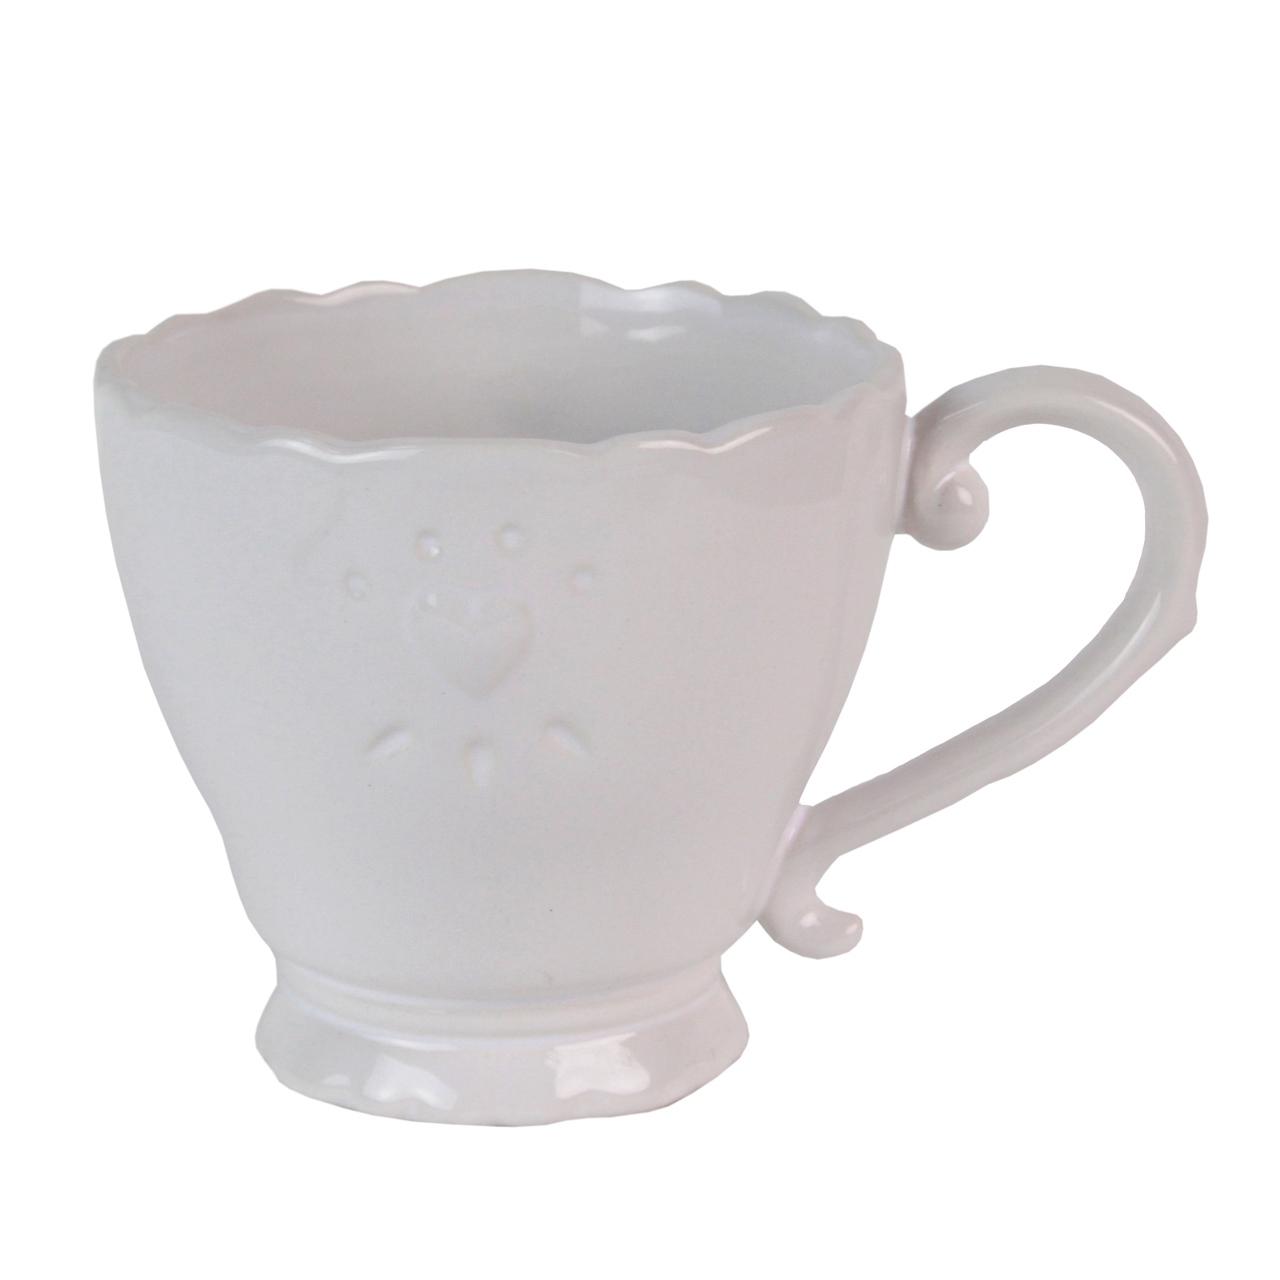 Ceasca Din Ceramica Alba 9.5 Cm